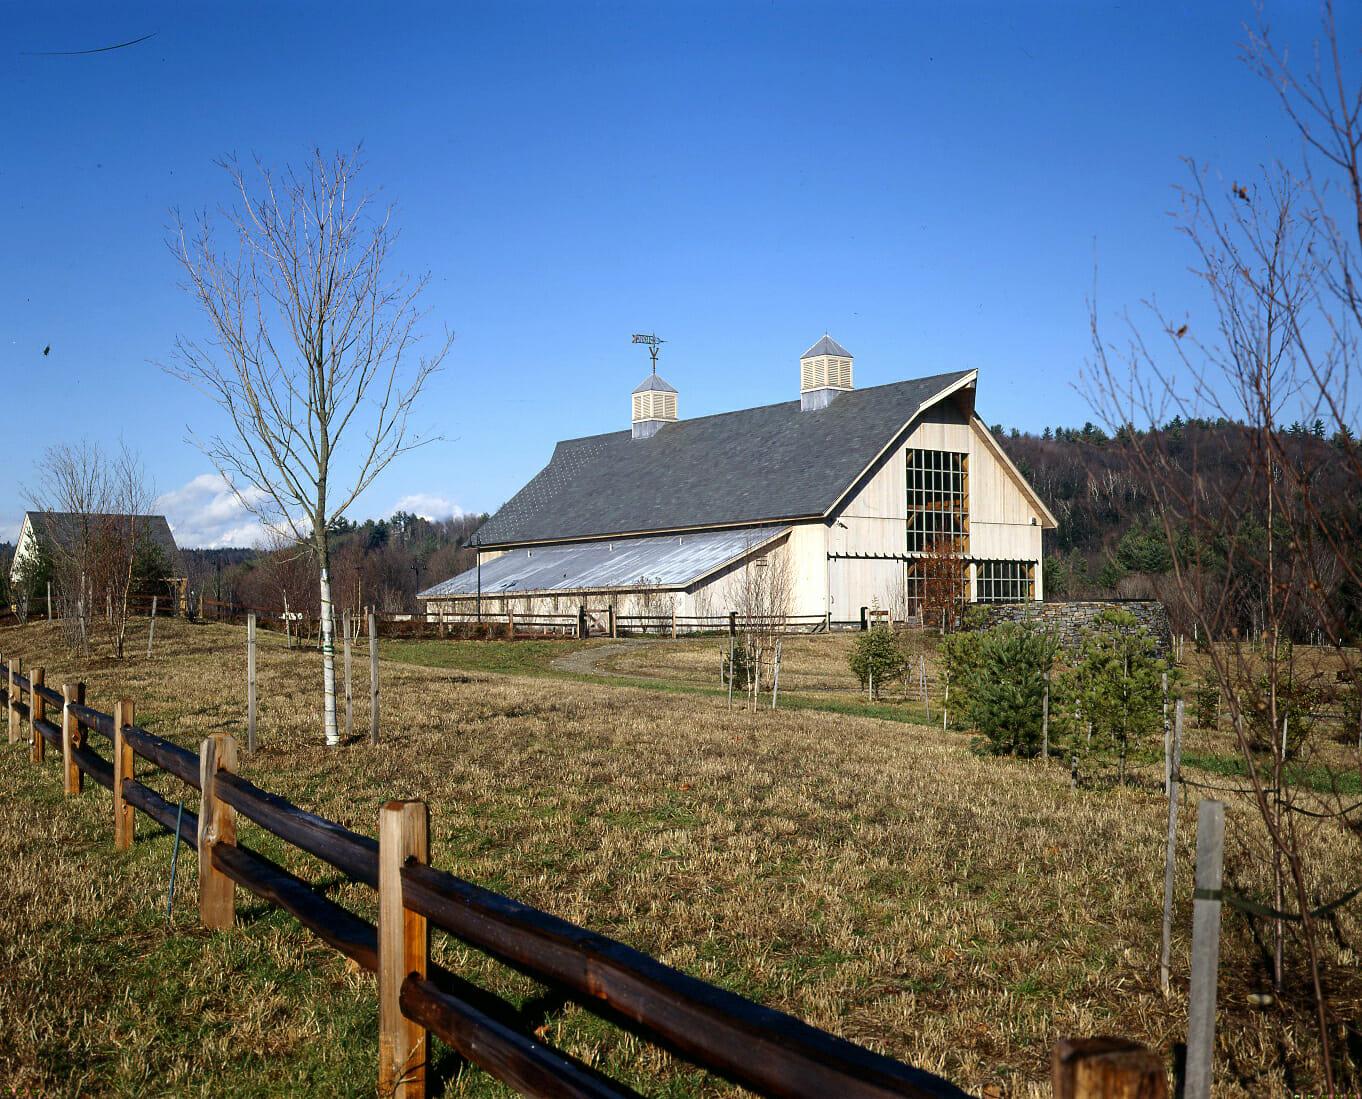 public timber frames to visit VT welcome center